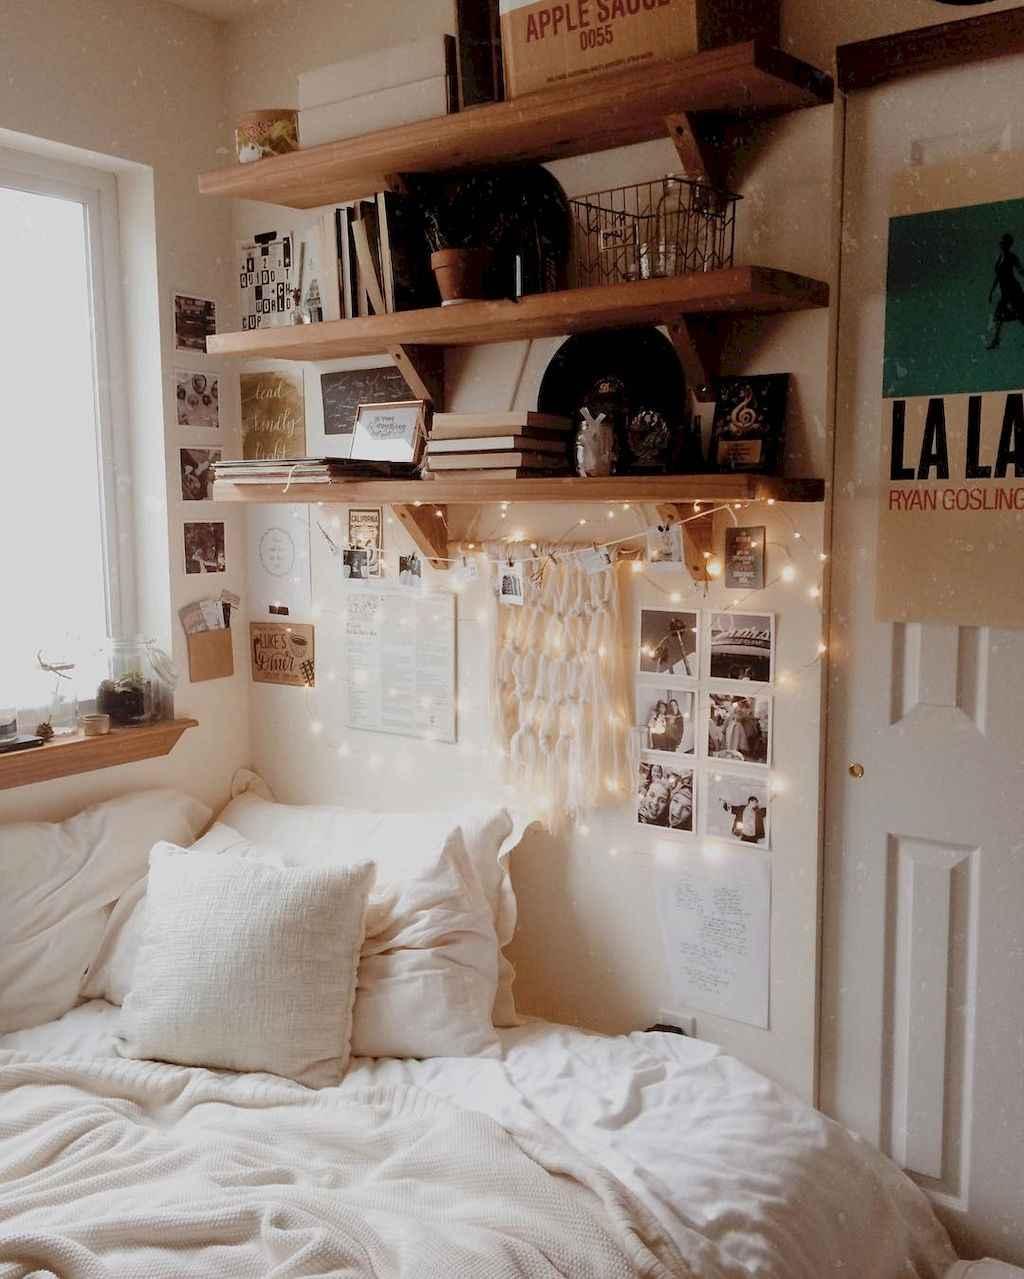 Cute diy dorm room decorating ideas on a budget (30)